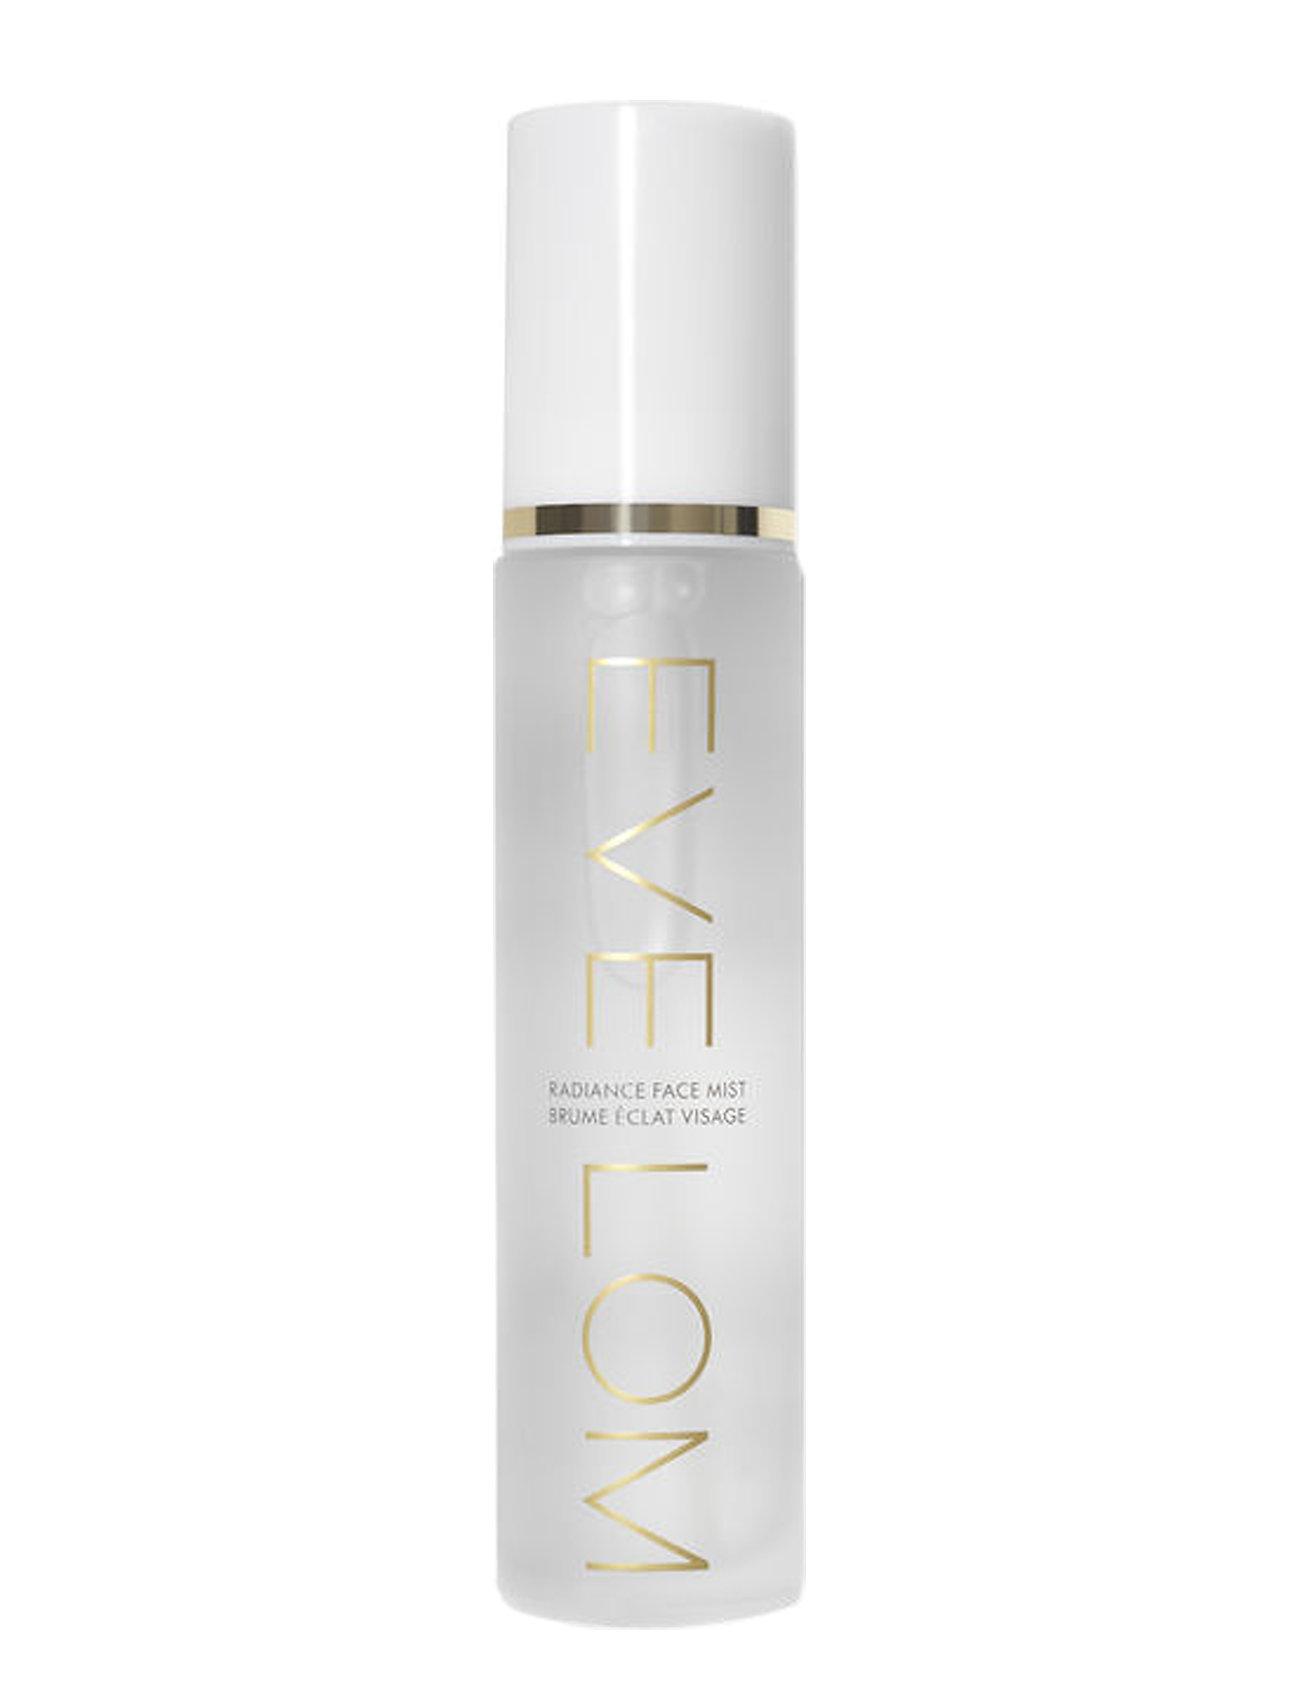 Image of El Radiance Face Mist Beauty WOMEN Skin Care Face T Rs Nude EVE LOM (3291624829)